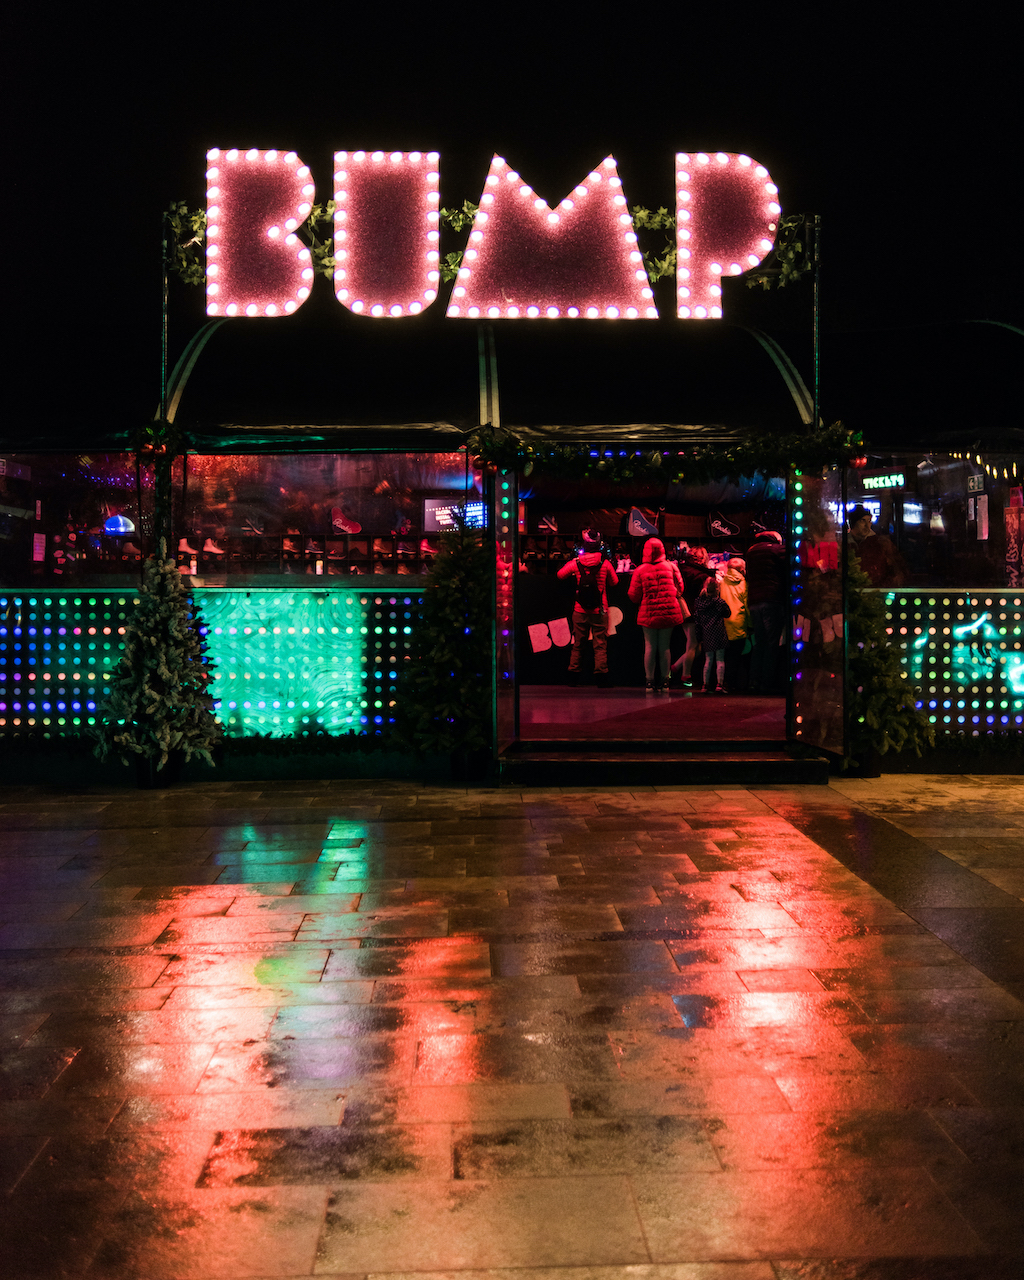 #MerryBristmas Image credit: BUMP